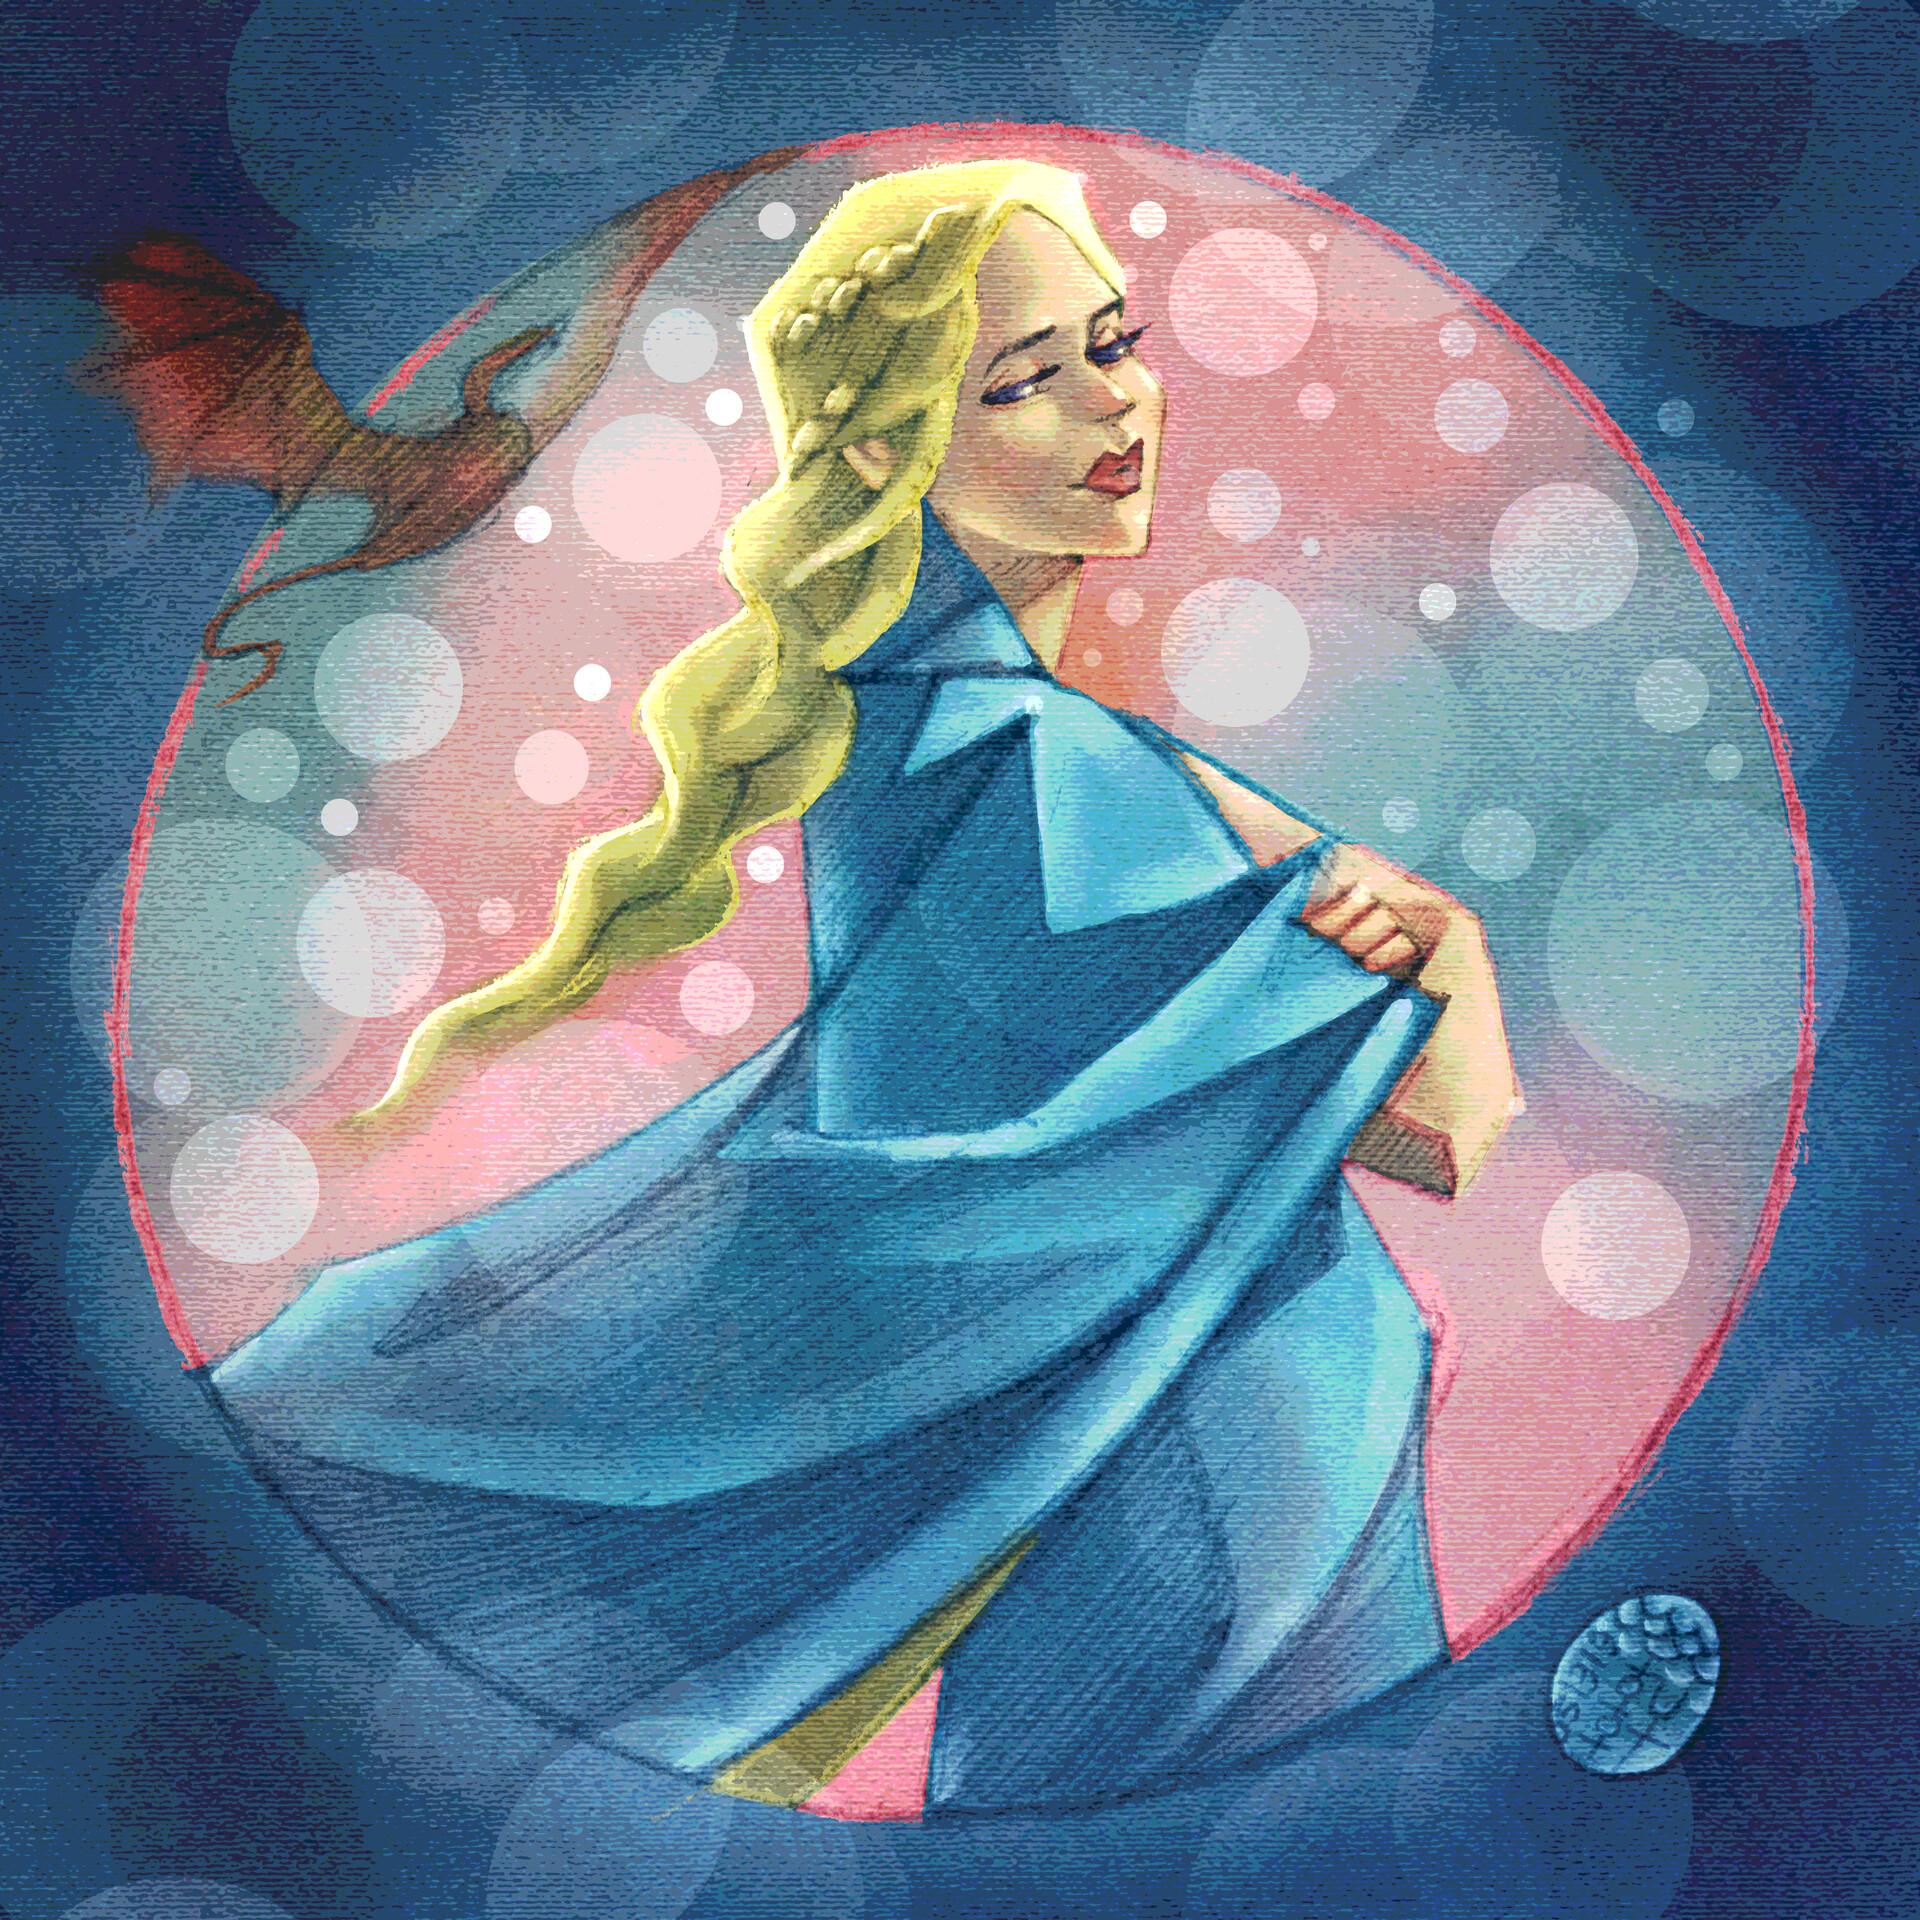 Eric lynx lin daenerys blue01